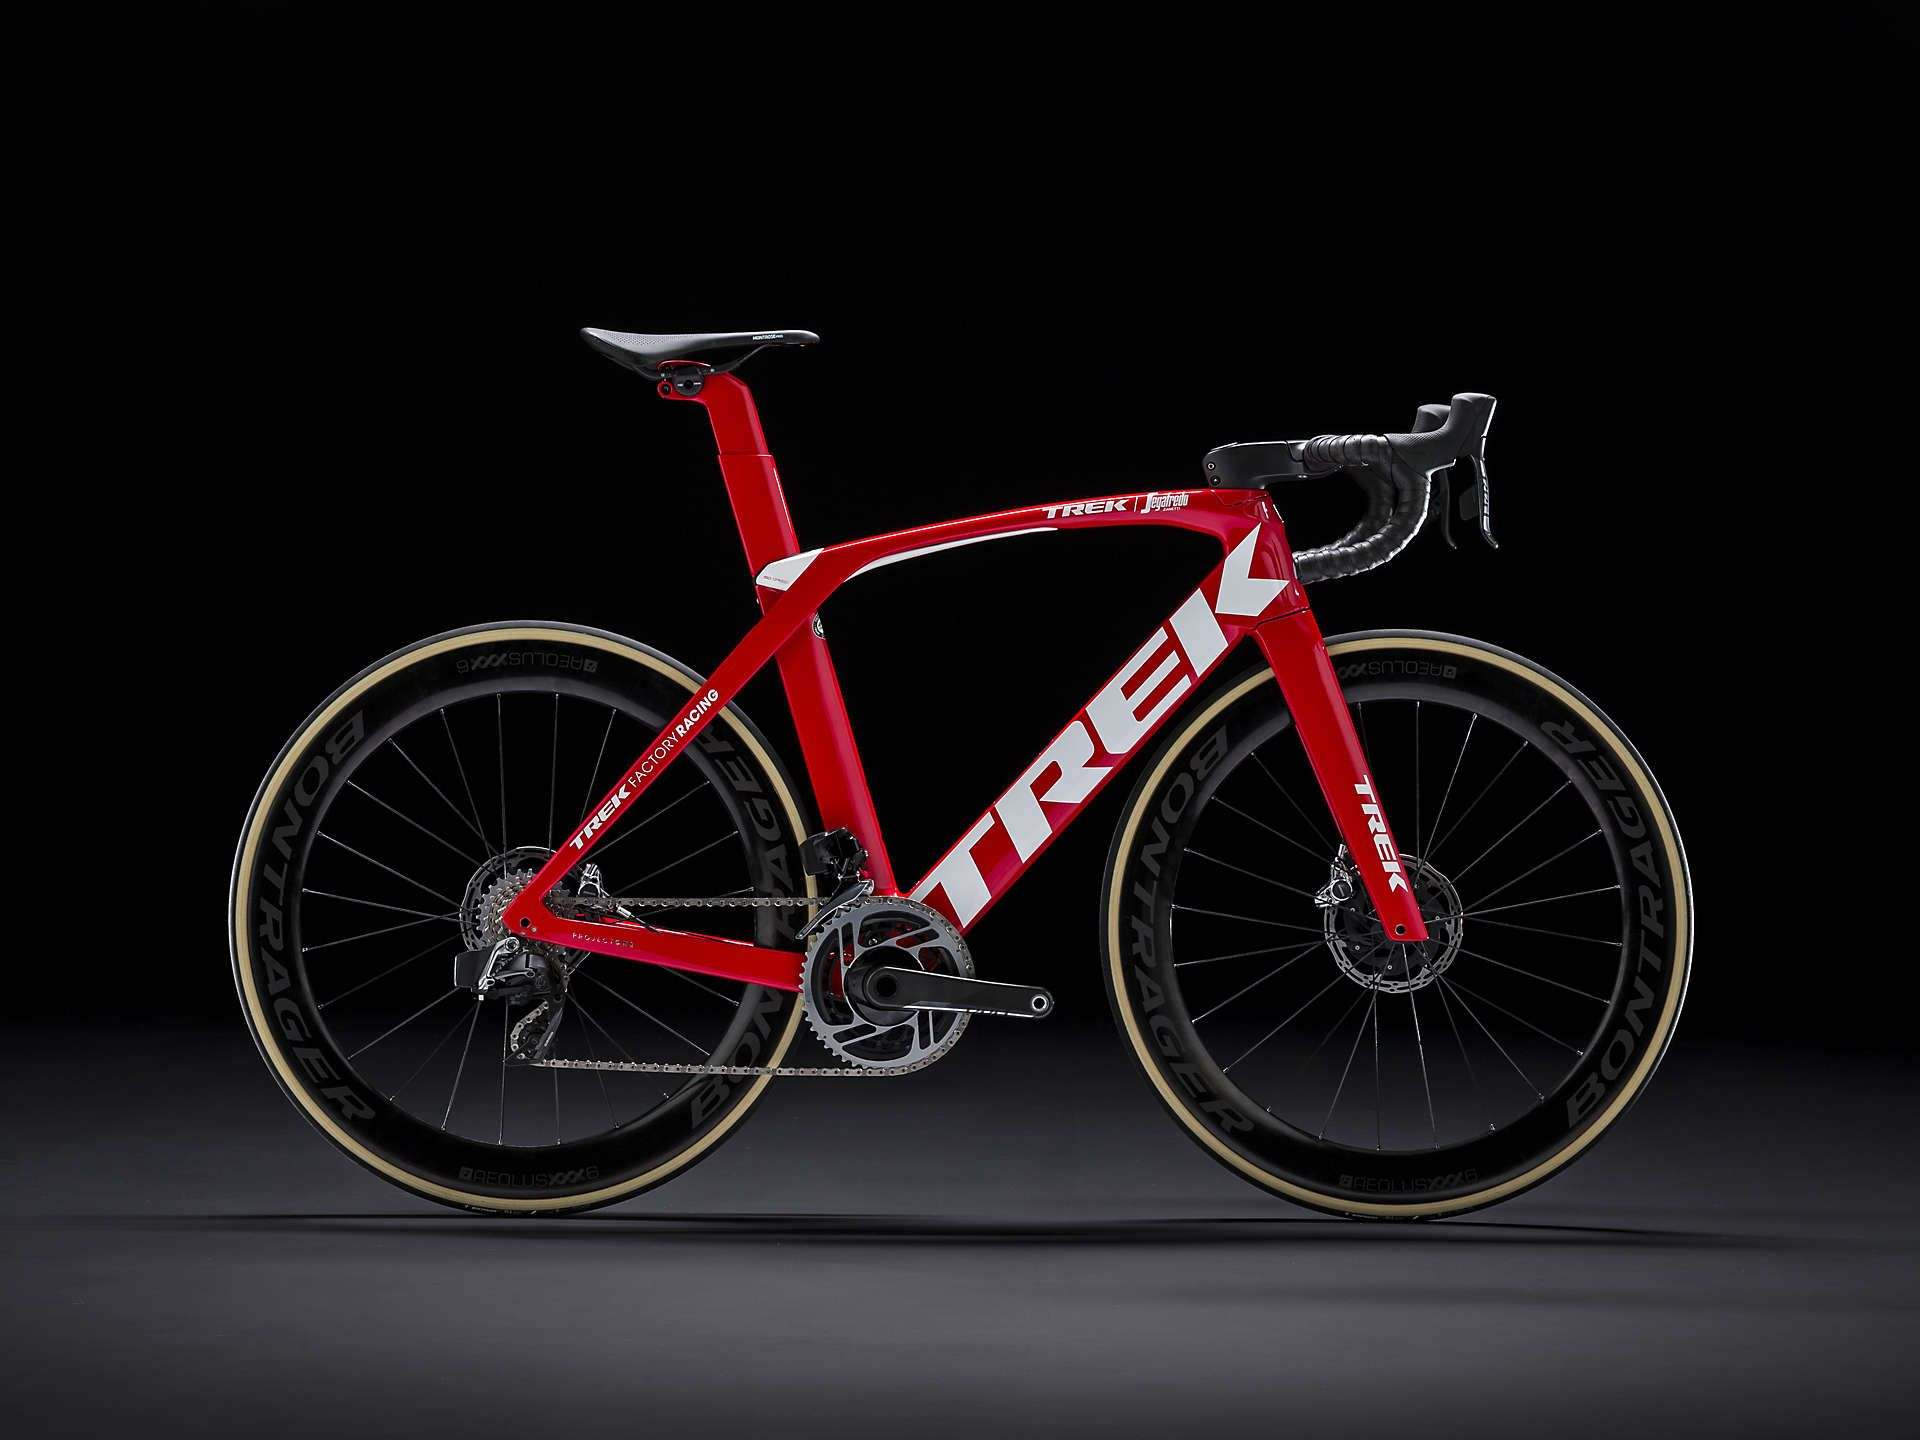 Madone Slr 9 Disc Etap Trek Bikes Trek Madone Trek Bikes